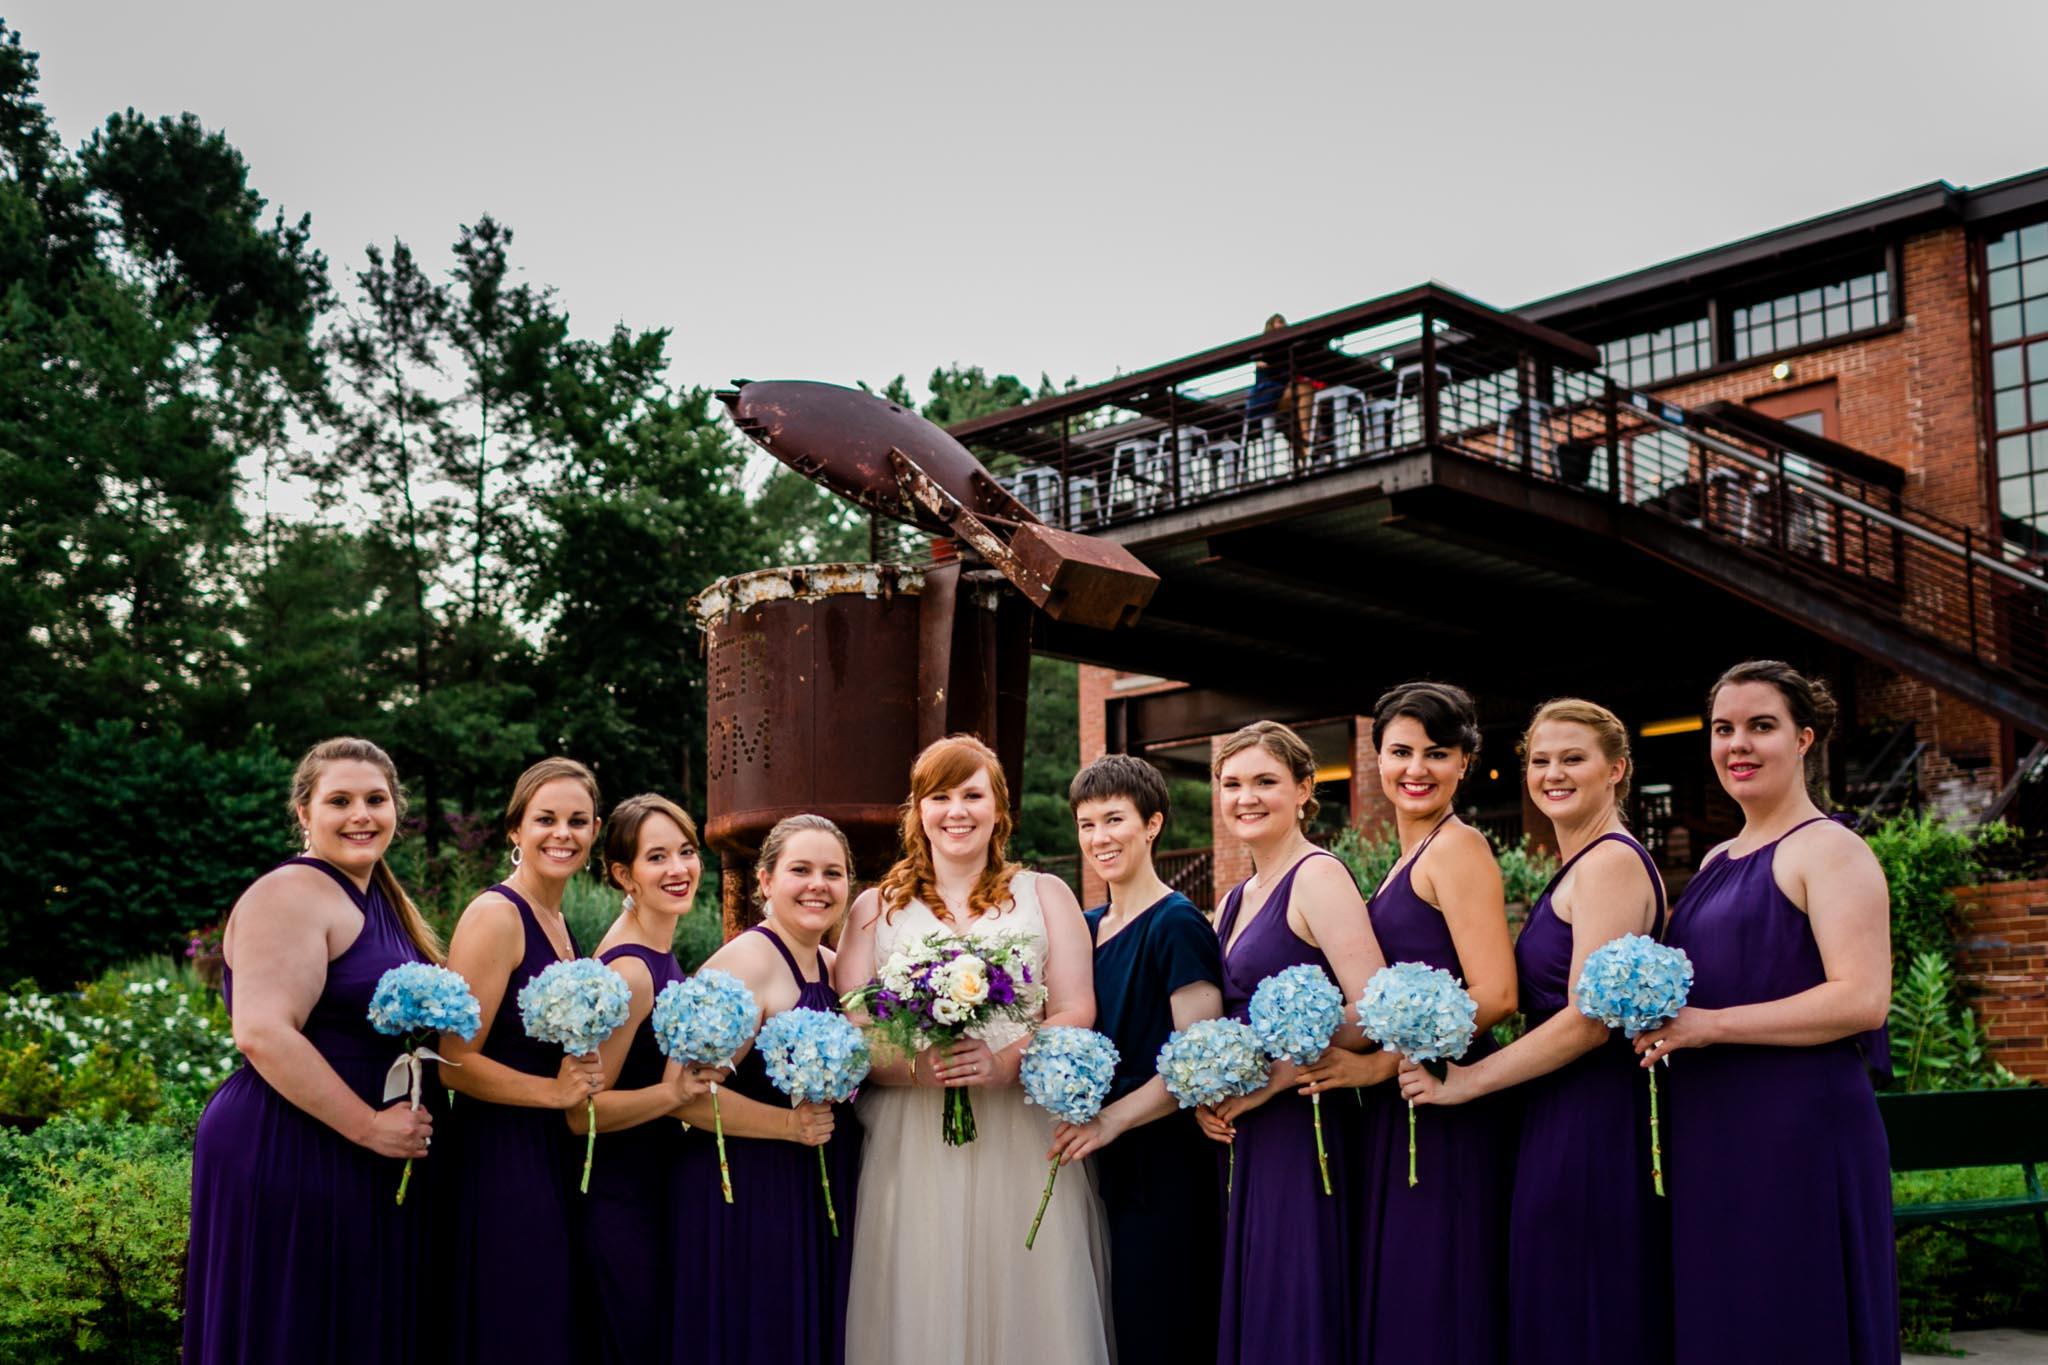 Bride with bridesmaids portrait   Haw River Ballroom Wedding   By G. Lin Photography   Durham Wedding Photographer